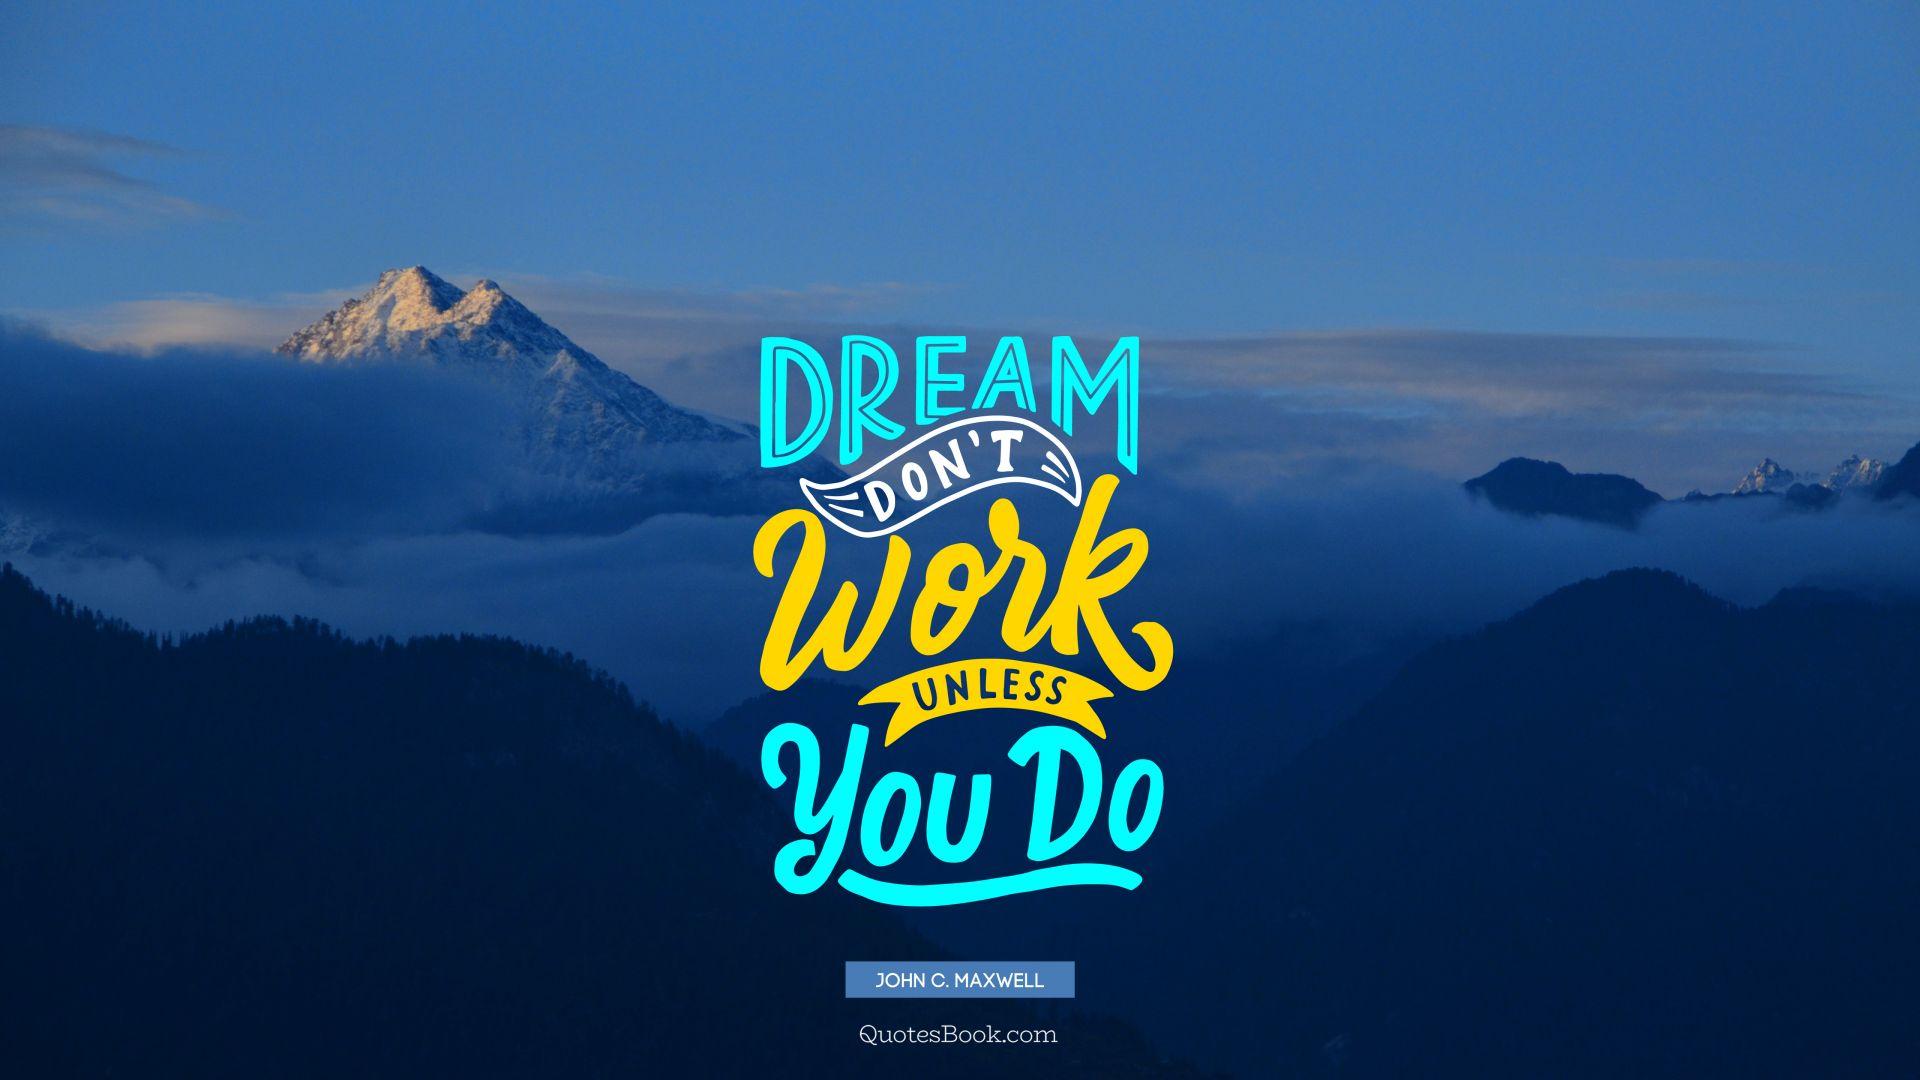 Dream Don T Work Unless You Do - Dream Don T Work - HD Wallpaper